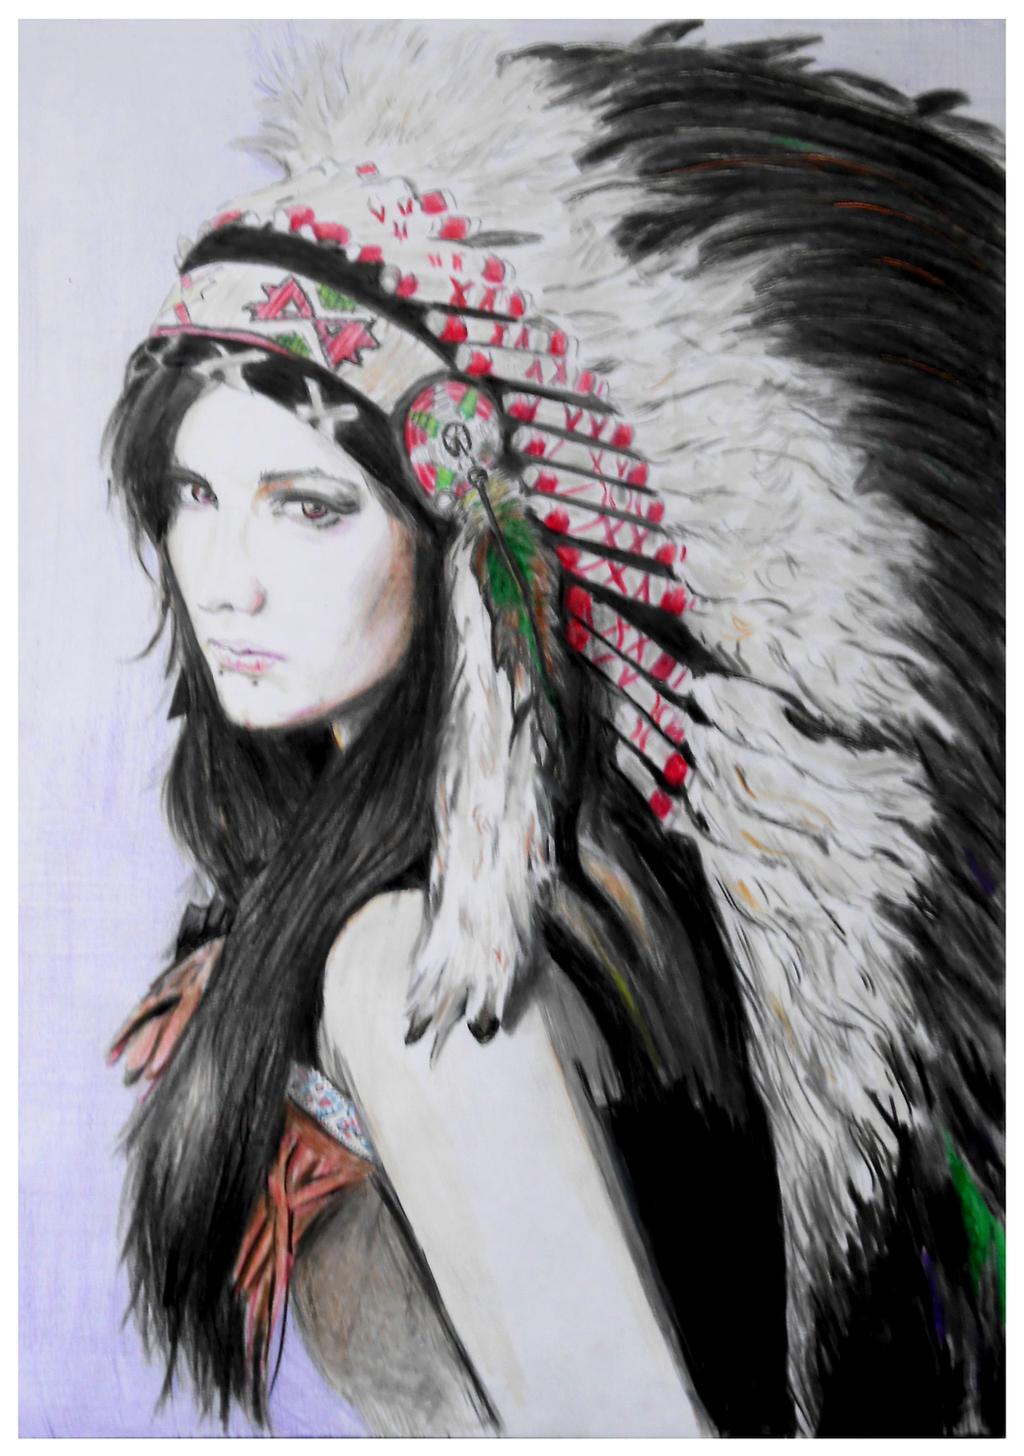 Native American girl by mychemplan on DeviantArt